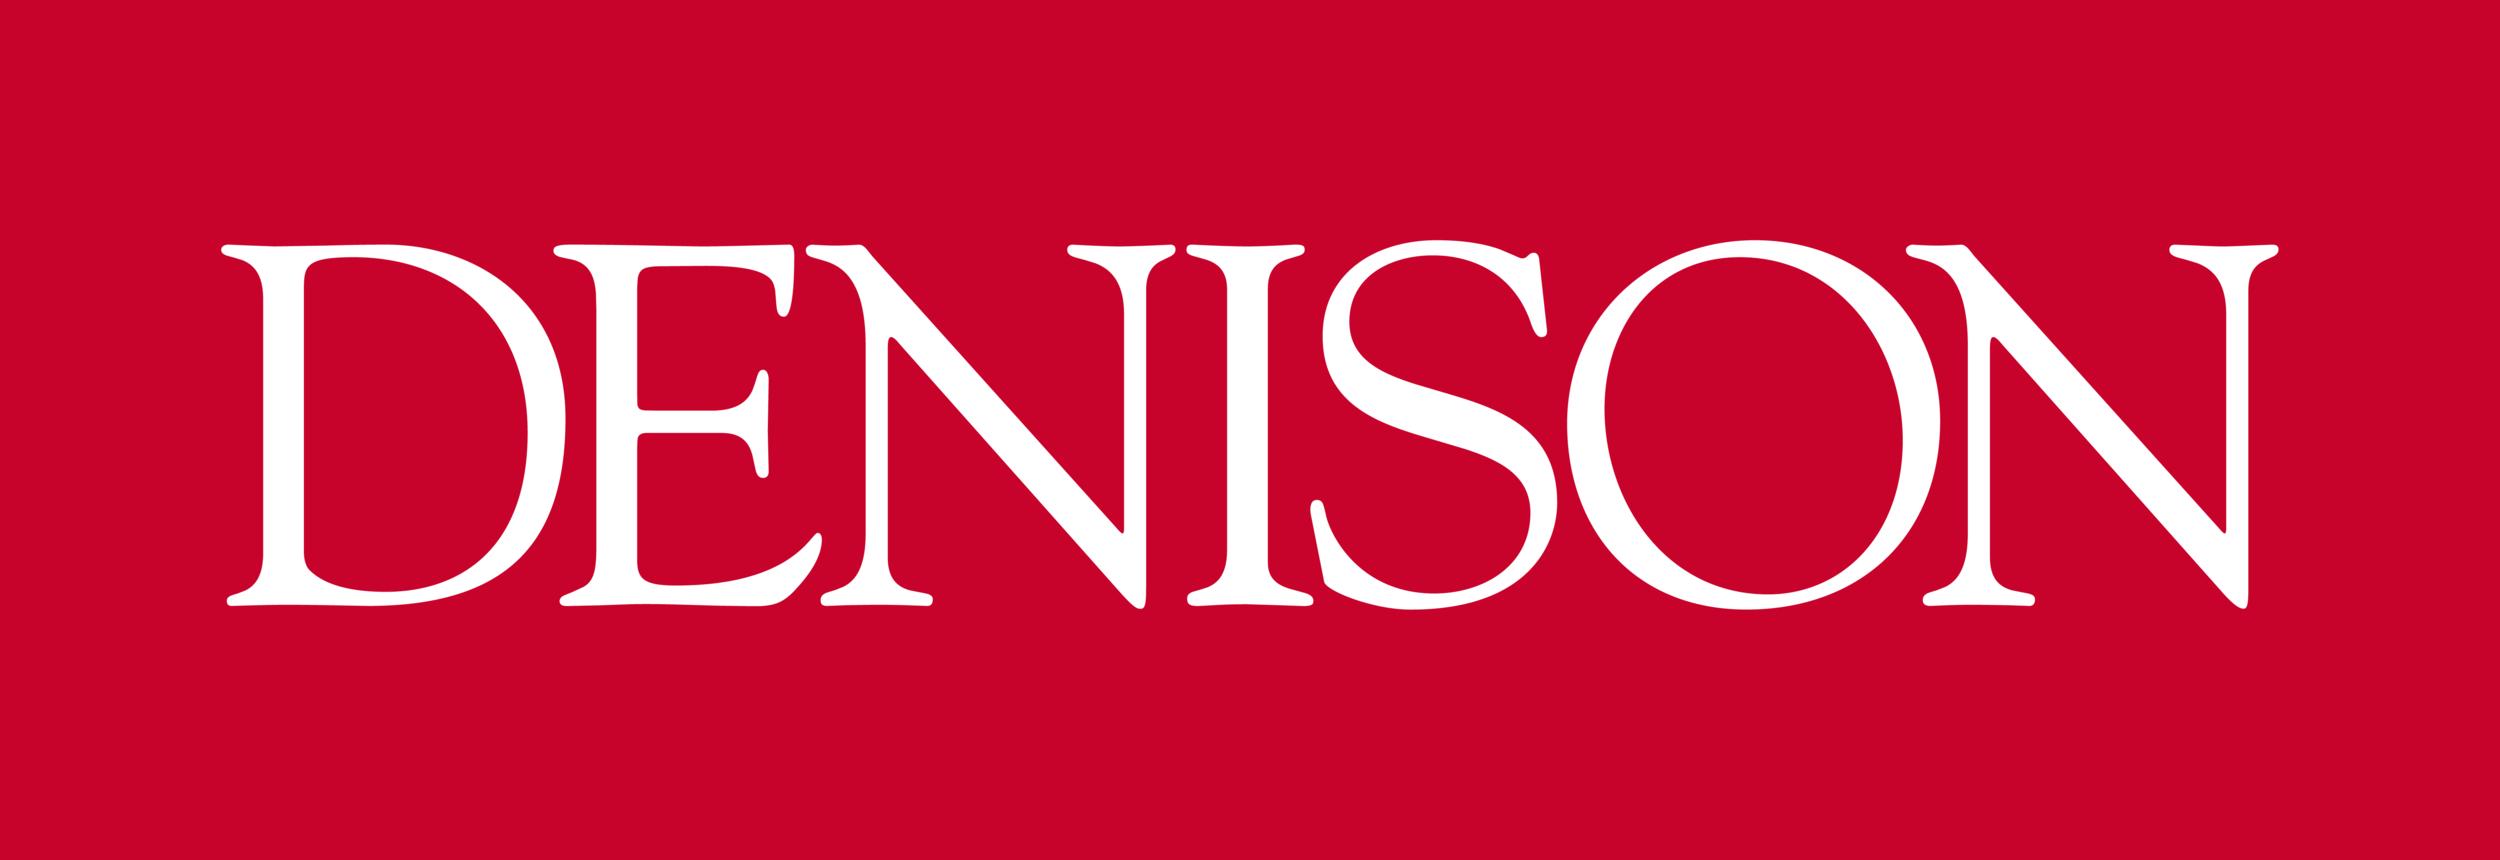 denison-university-logo.png